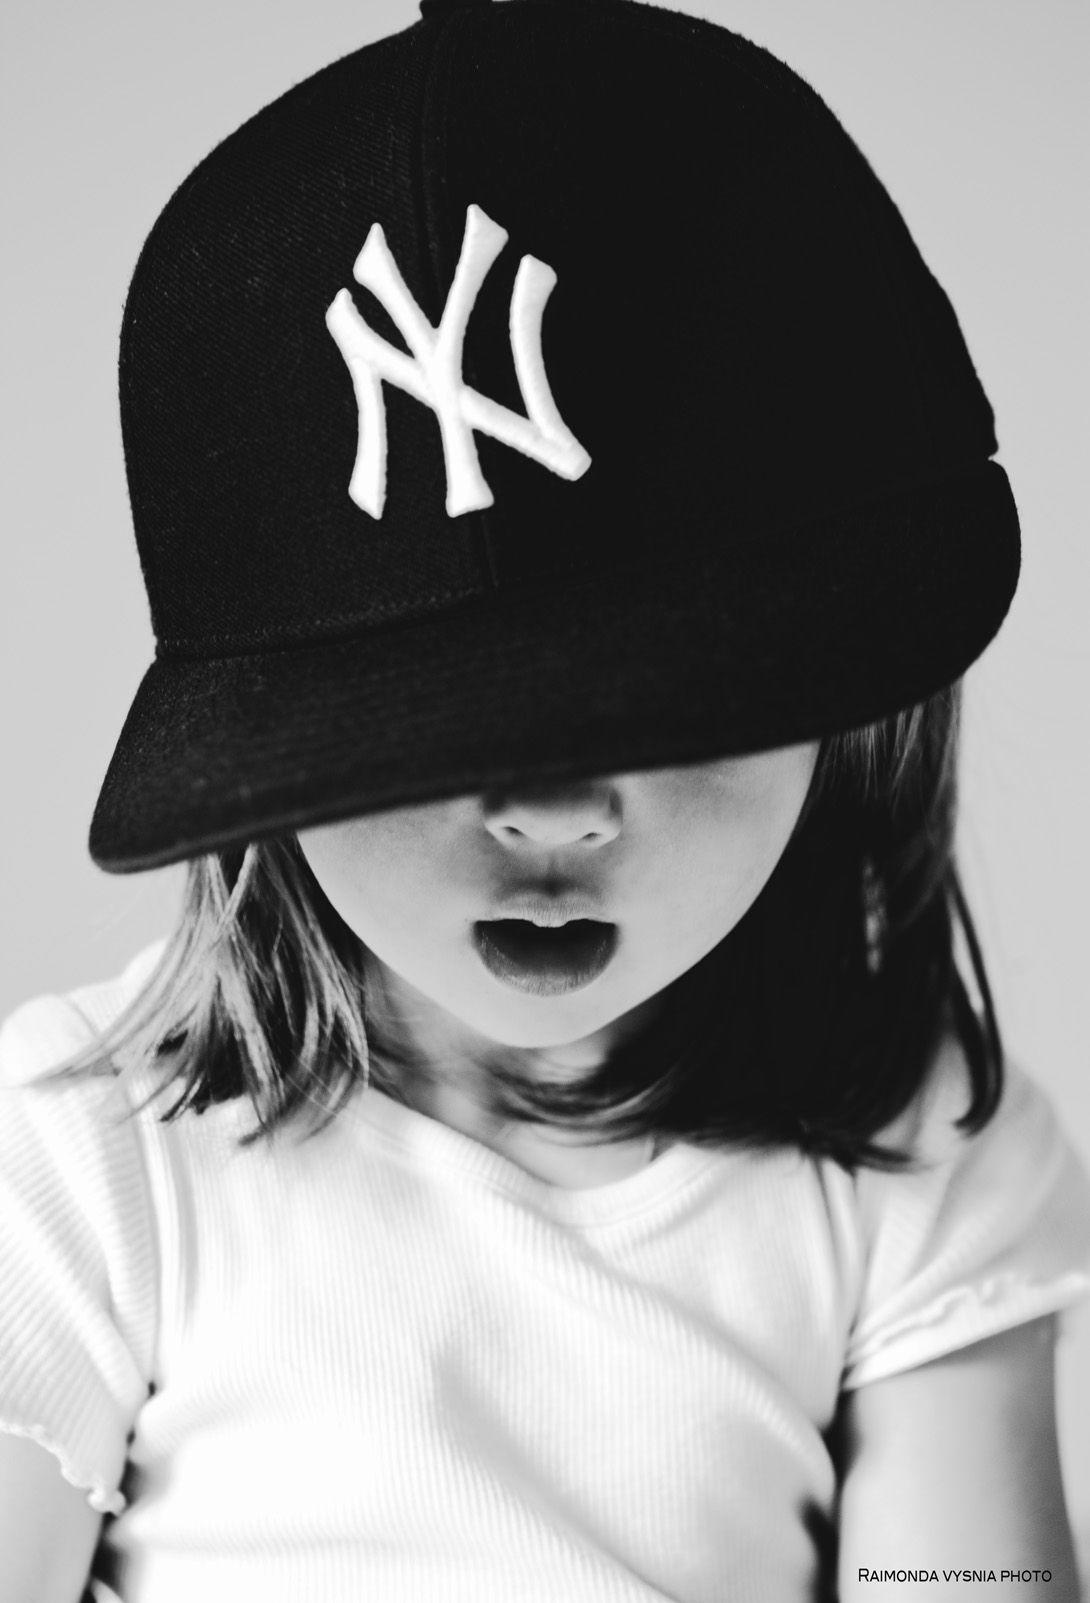 CAP. yankees. Stylish Caps 9aa840aef1c